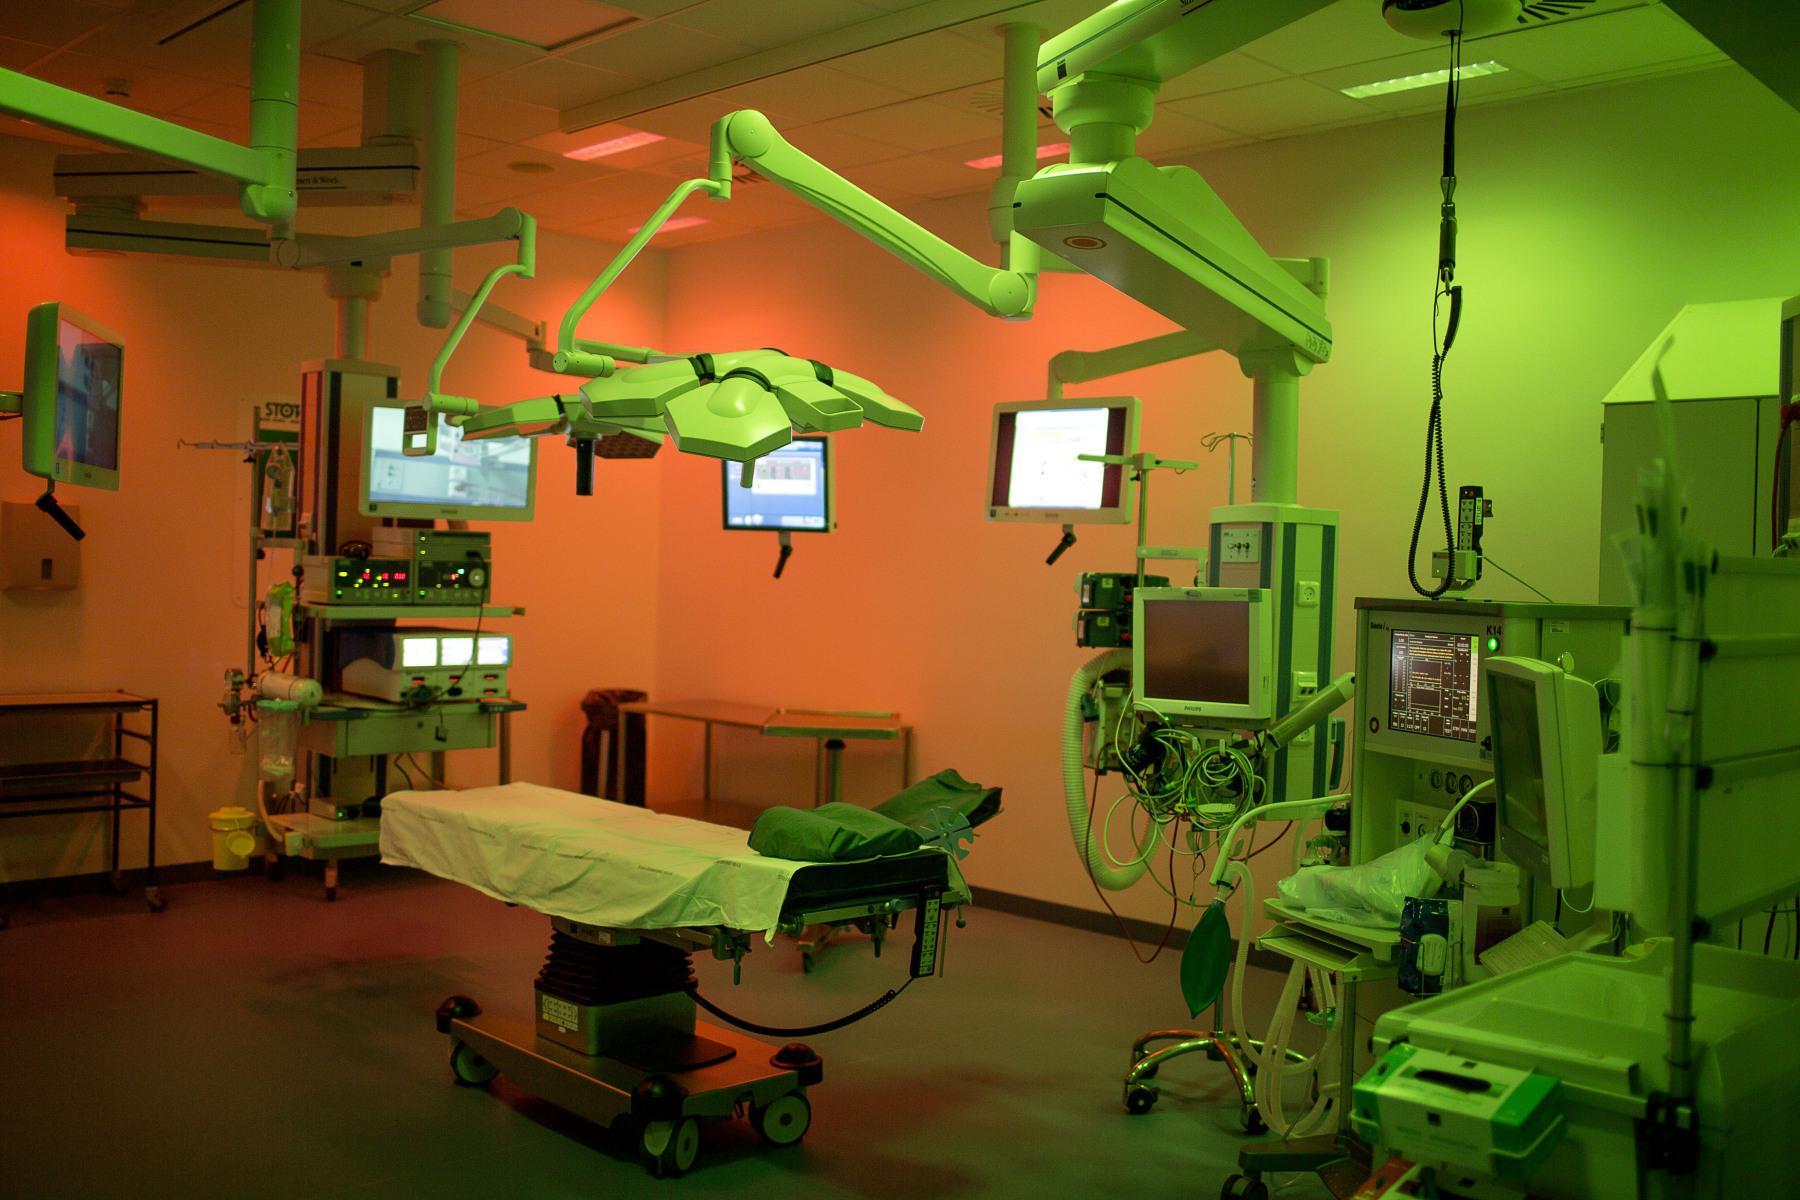 Ny OP stue på organkirurgisk afd. på Kolding sygehus